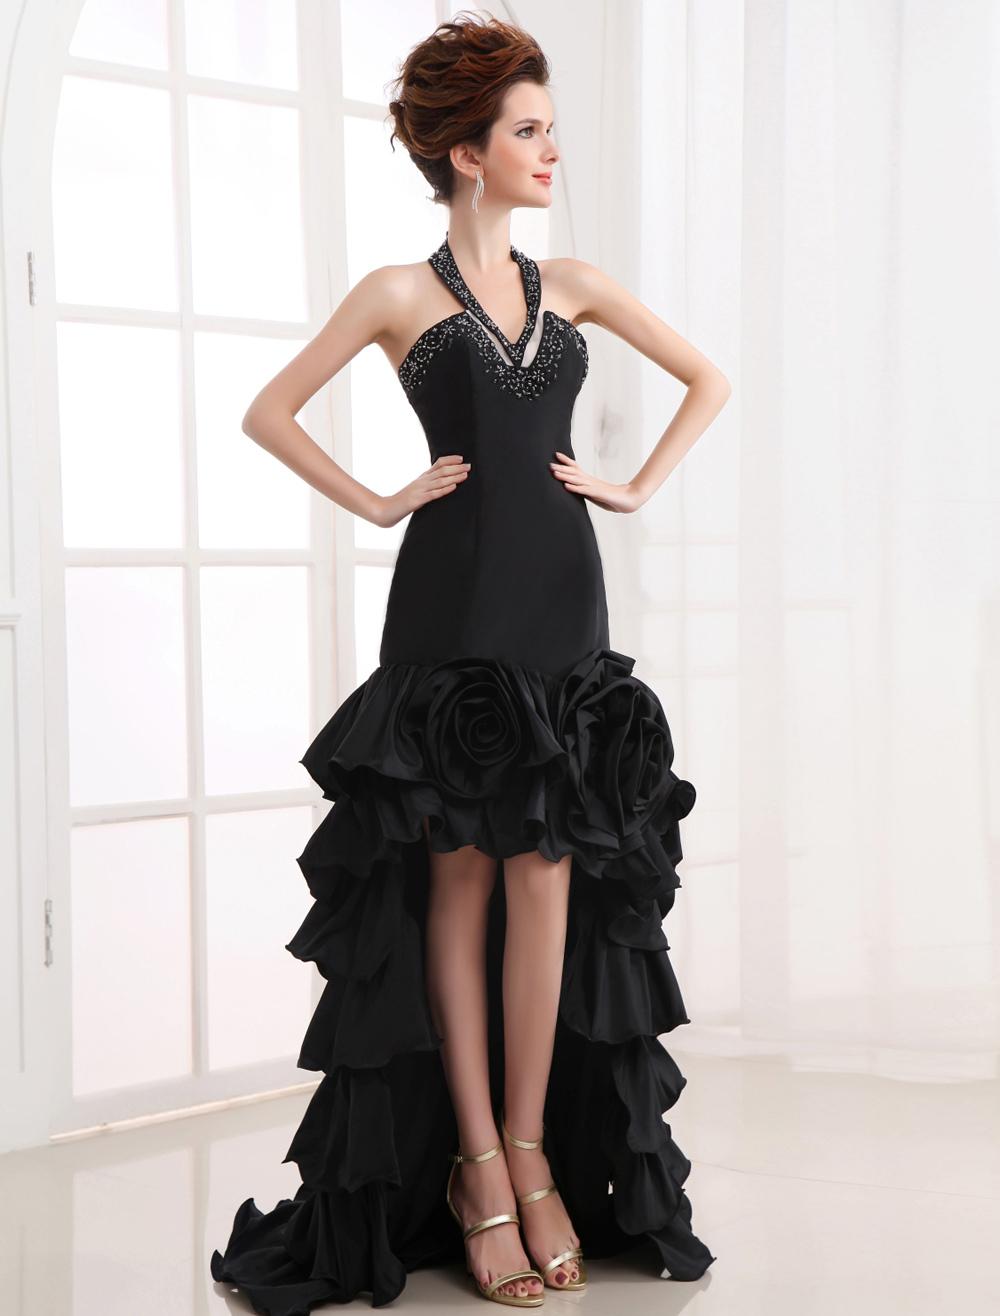 High-Low Black Wedding Dress Halter Neck Ruffle Taffeta Prom Dress (Prom Dresses) photo